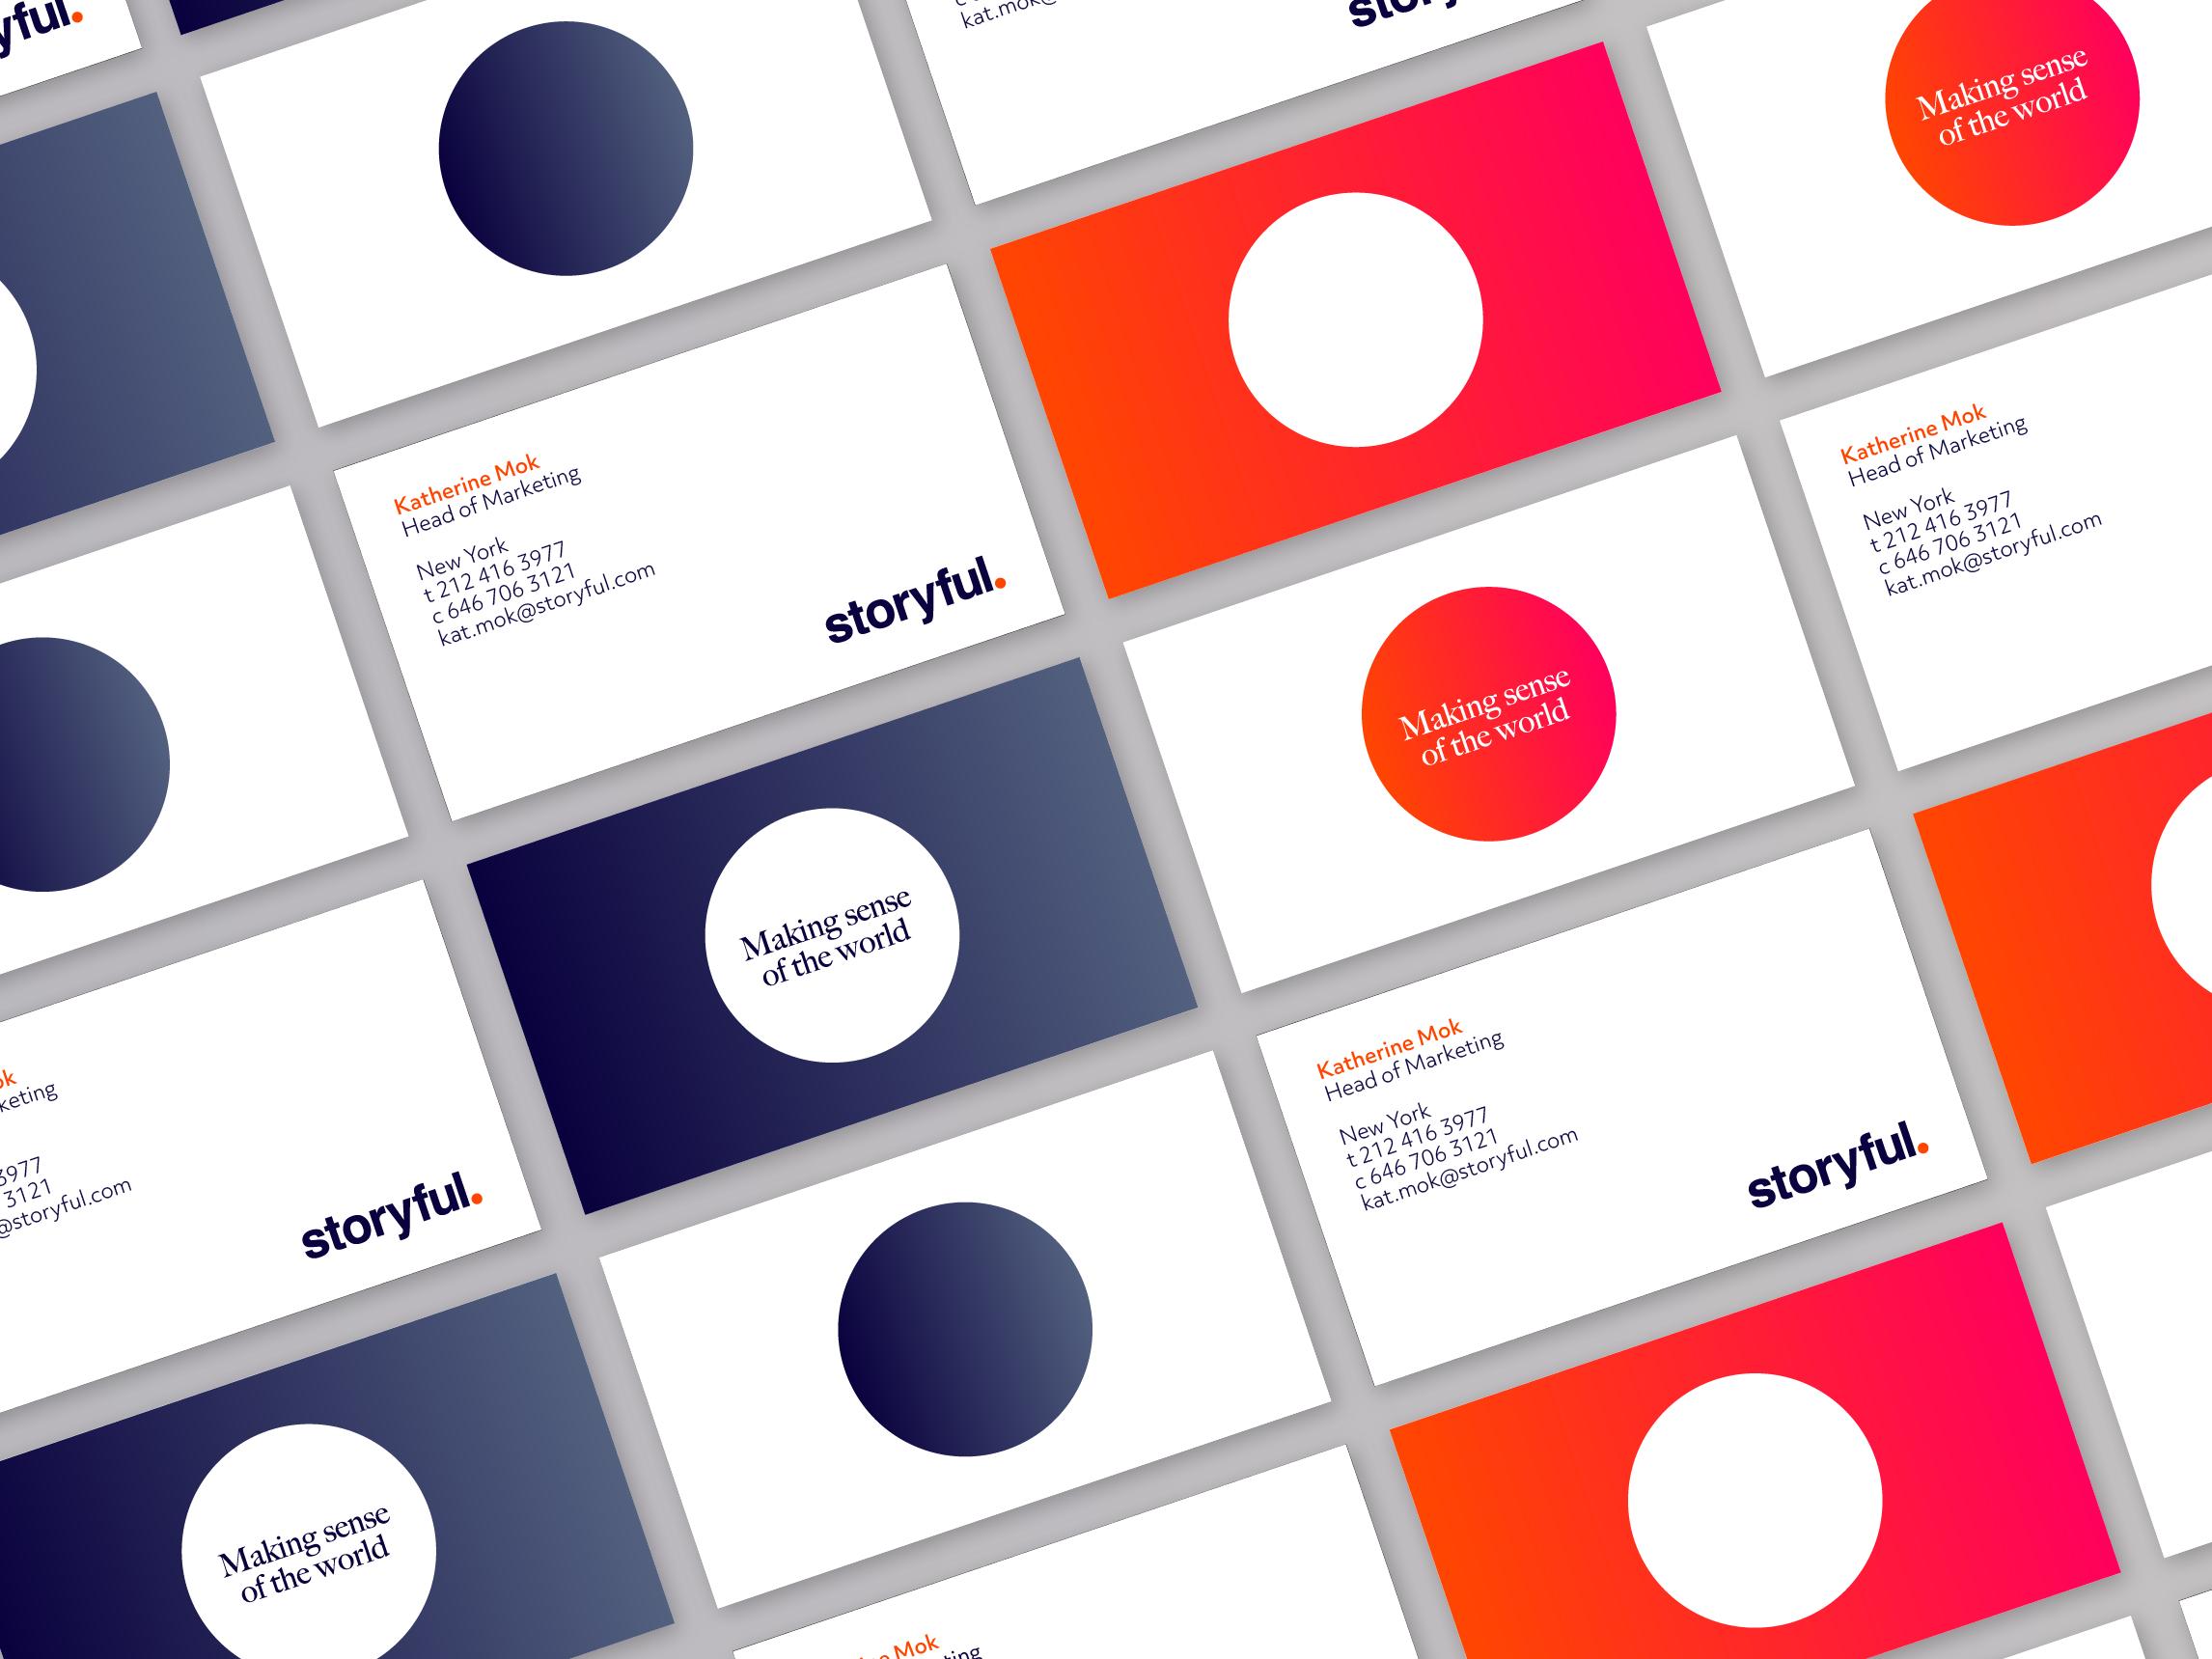 Business card mockups for Storyful